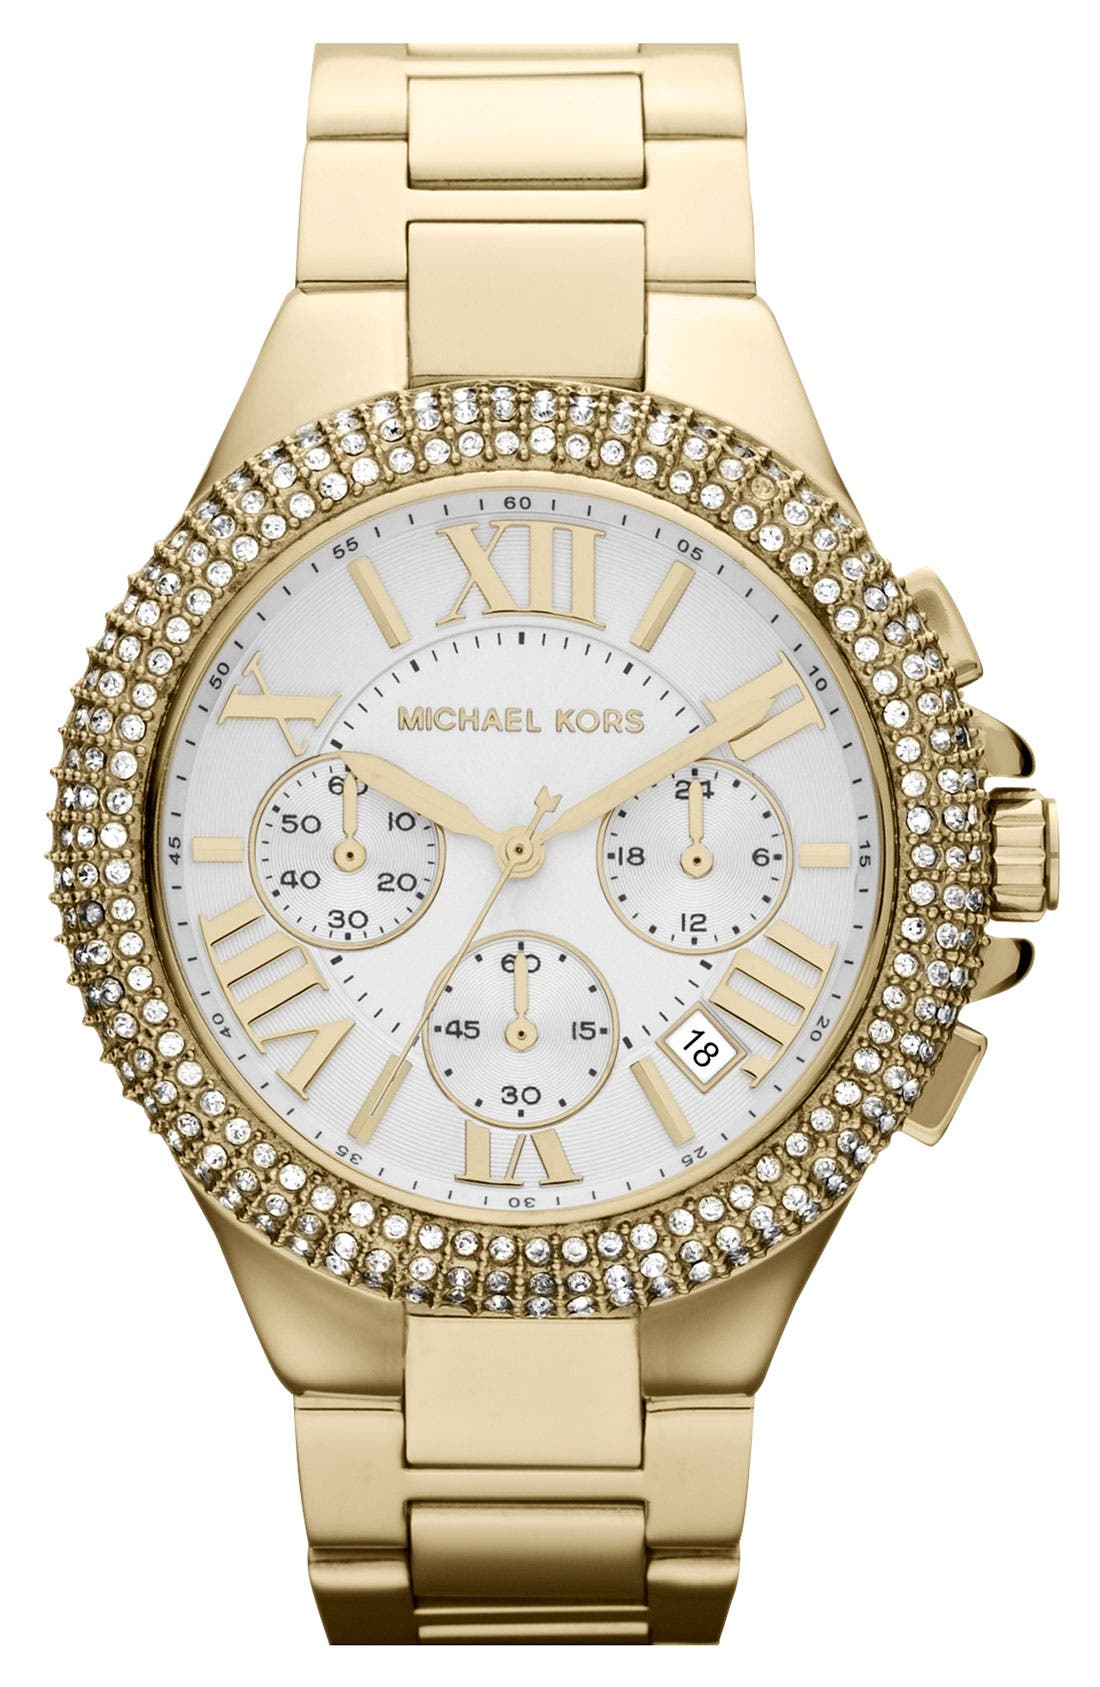 Main Image - Michael Kors 'Camille' Chronograph Bracelet Watch, 43mm